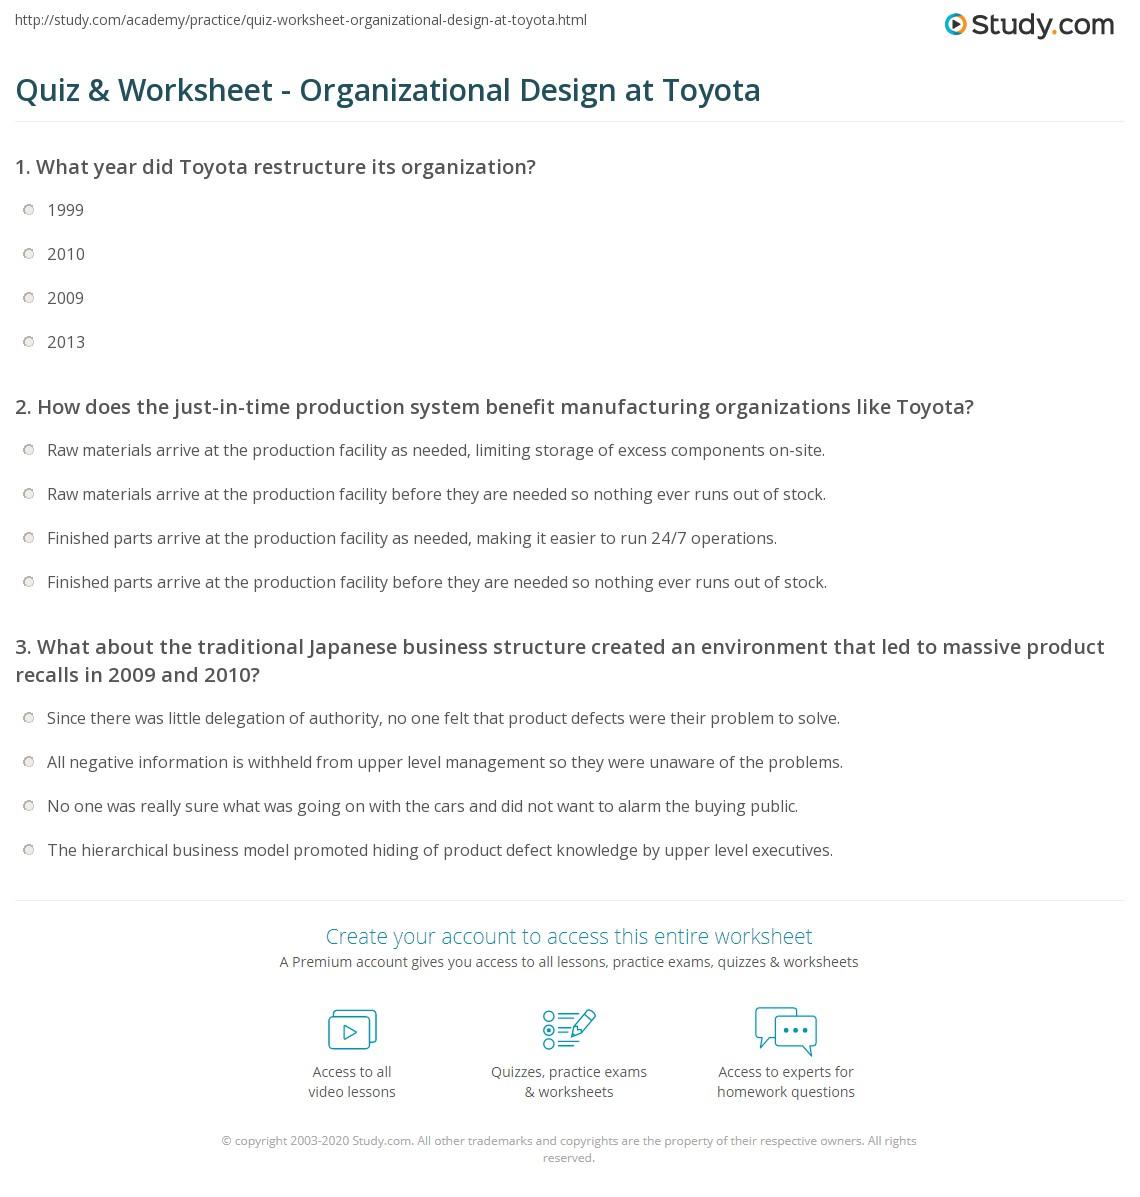 Quiz & Worksheet - Organizational Design at Toyota | Study.com